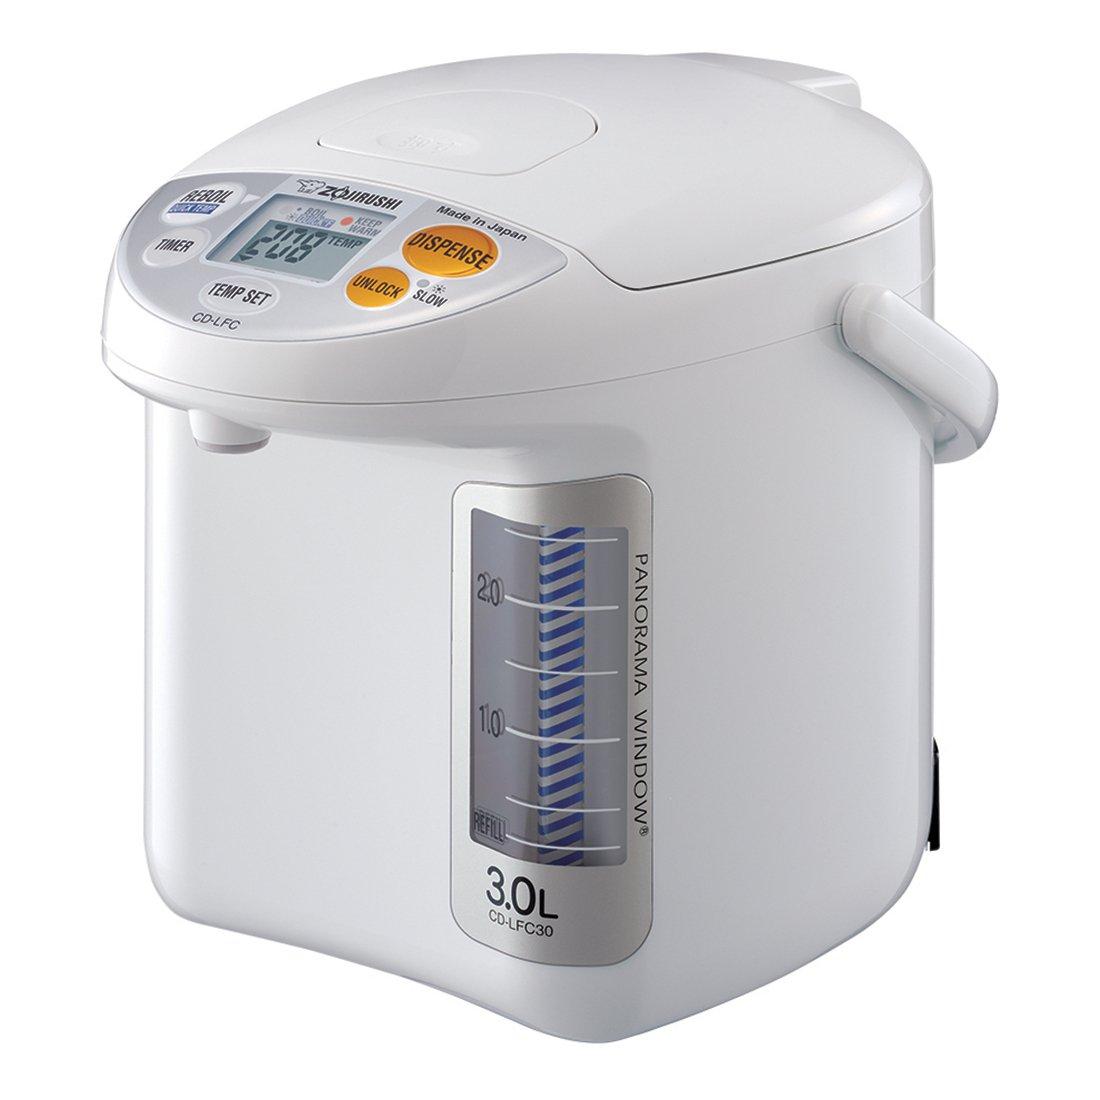 Zojirushi CD-LFC30 Panorama Window Micom Water Boiler and Warmer, 101 oz/3.0 L, White